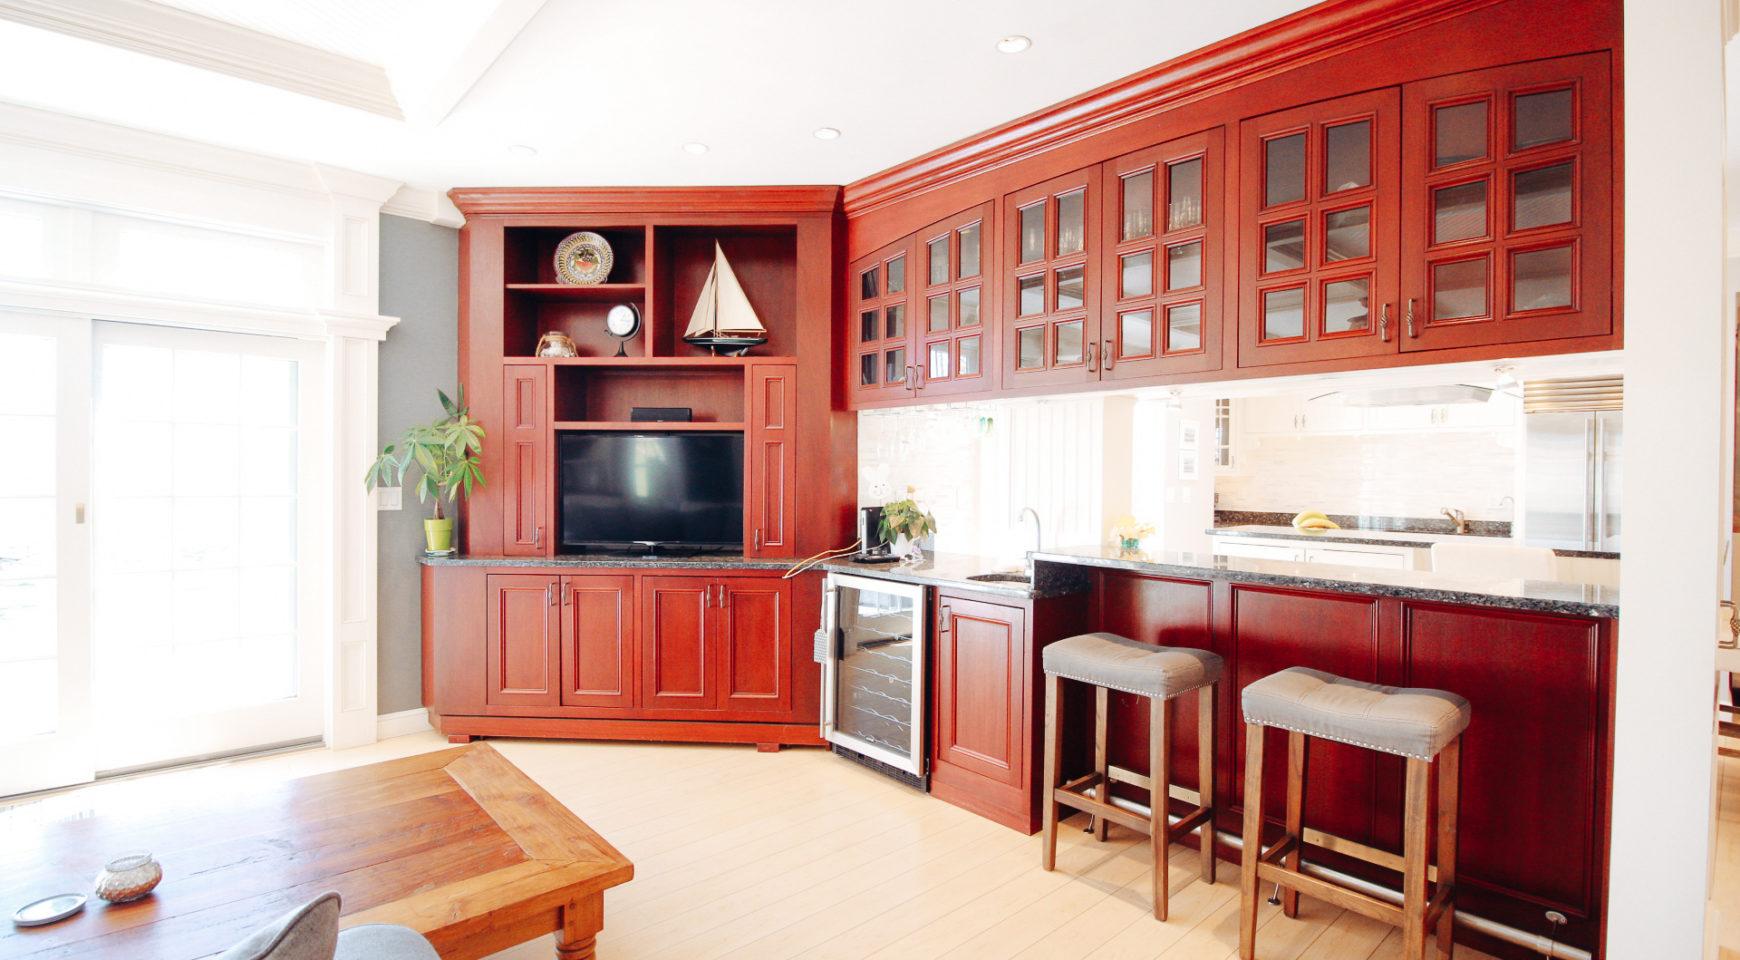 Luxe_and_Livable_Interior_Design_Blog_by_Maloney_Interiors_Newport_Rhode_Island_Fitzpatrick_Team_Remax_14.jpg